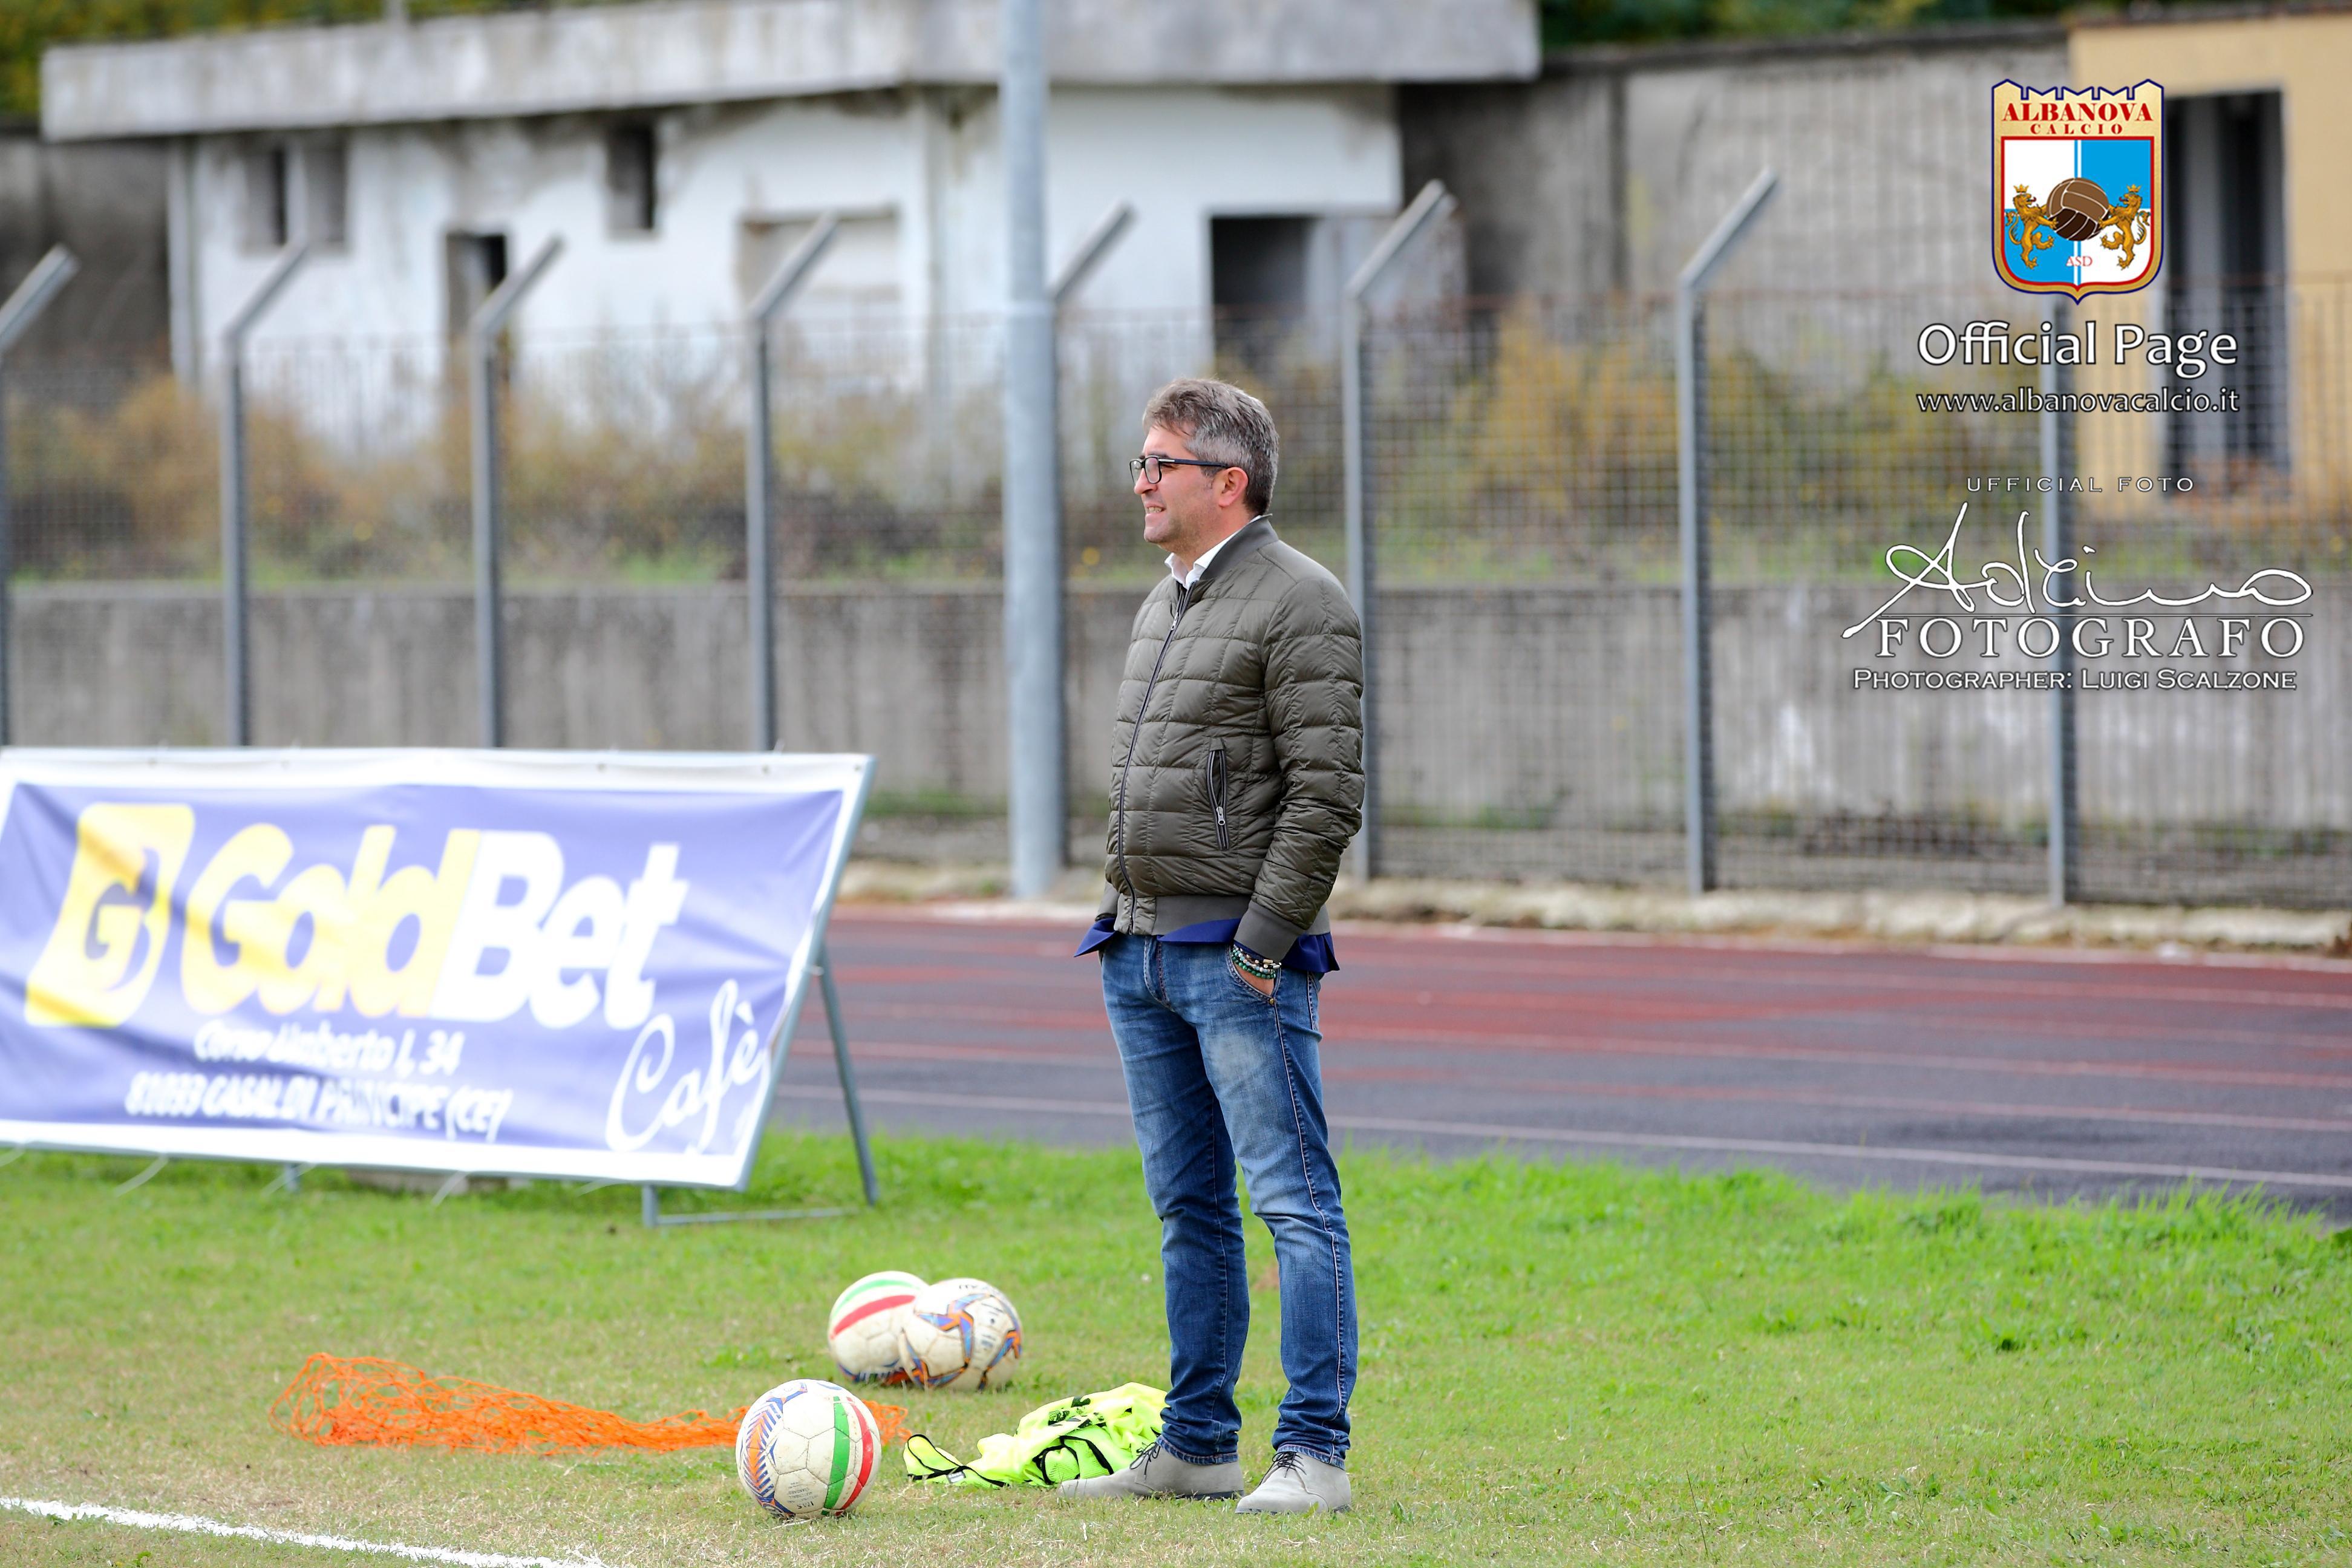 Albanova-Virtus Goti: si gioca a Trentola Ducenta